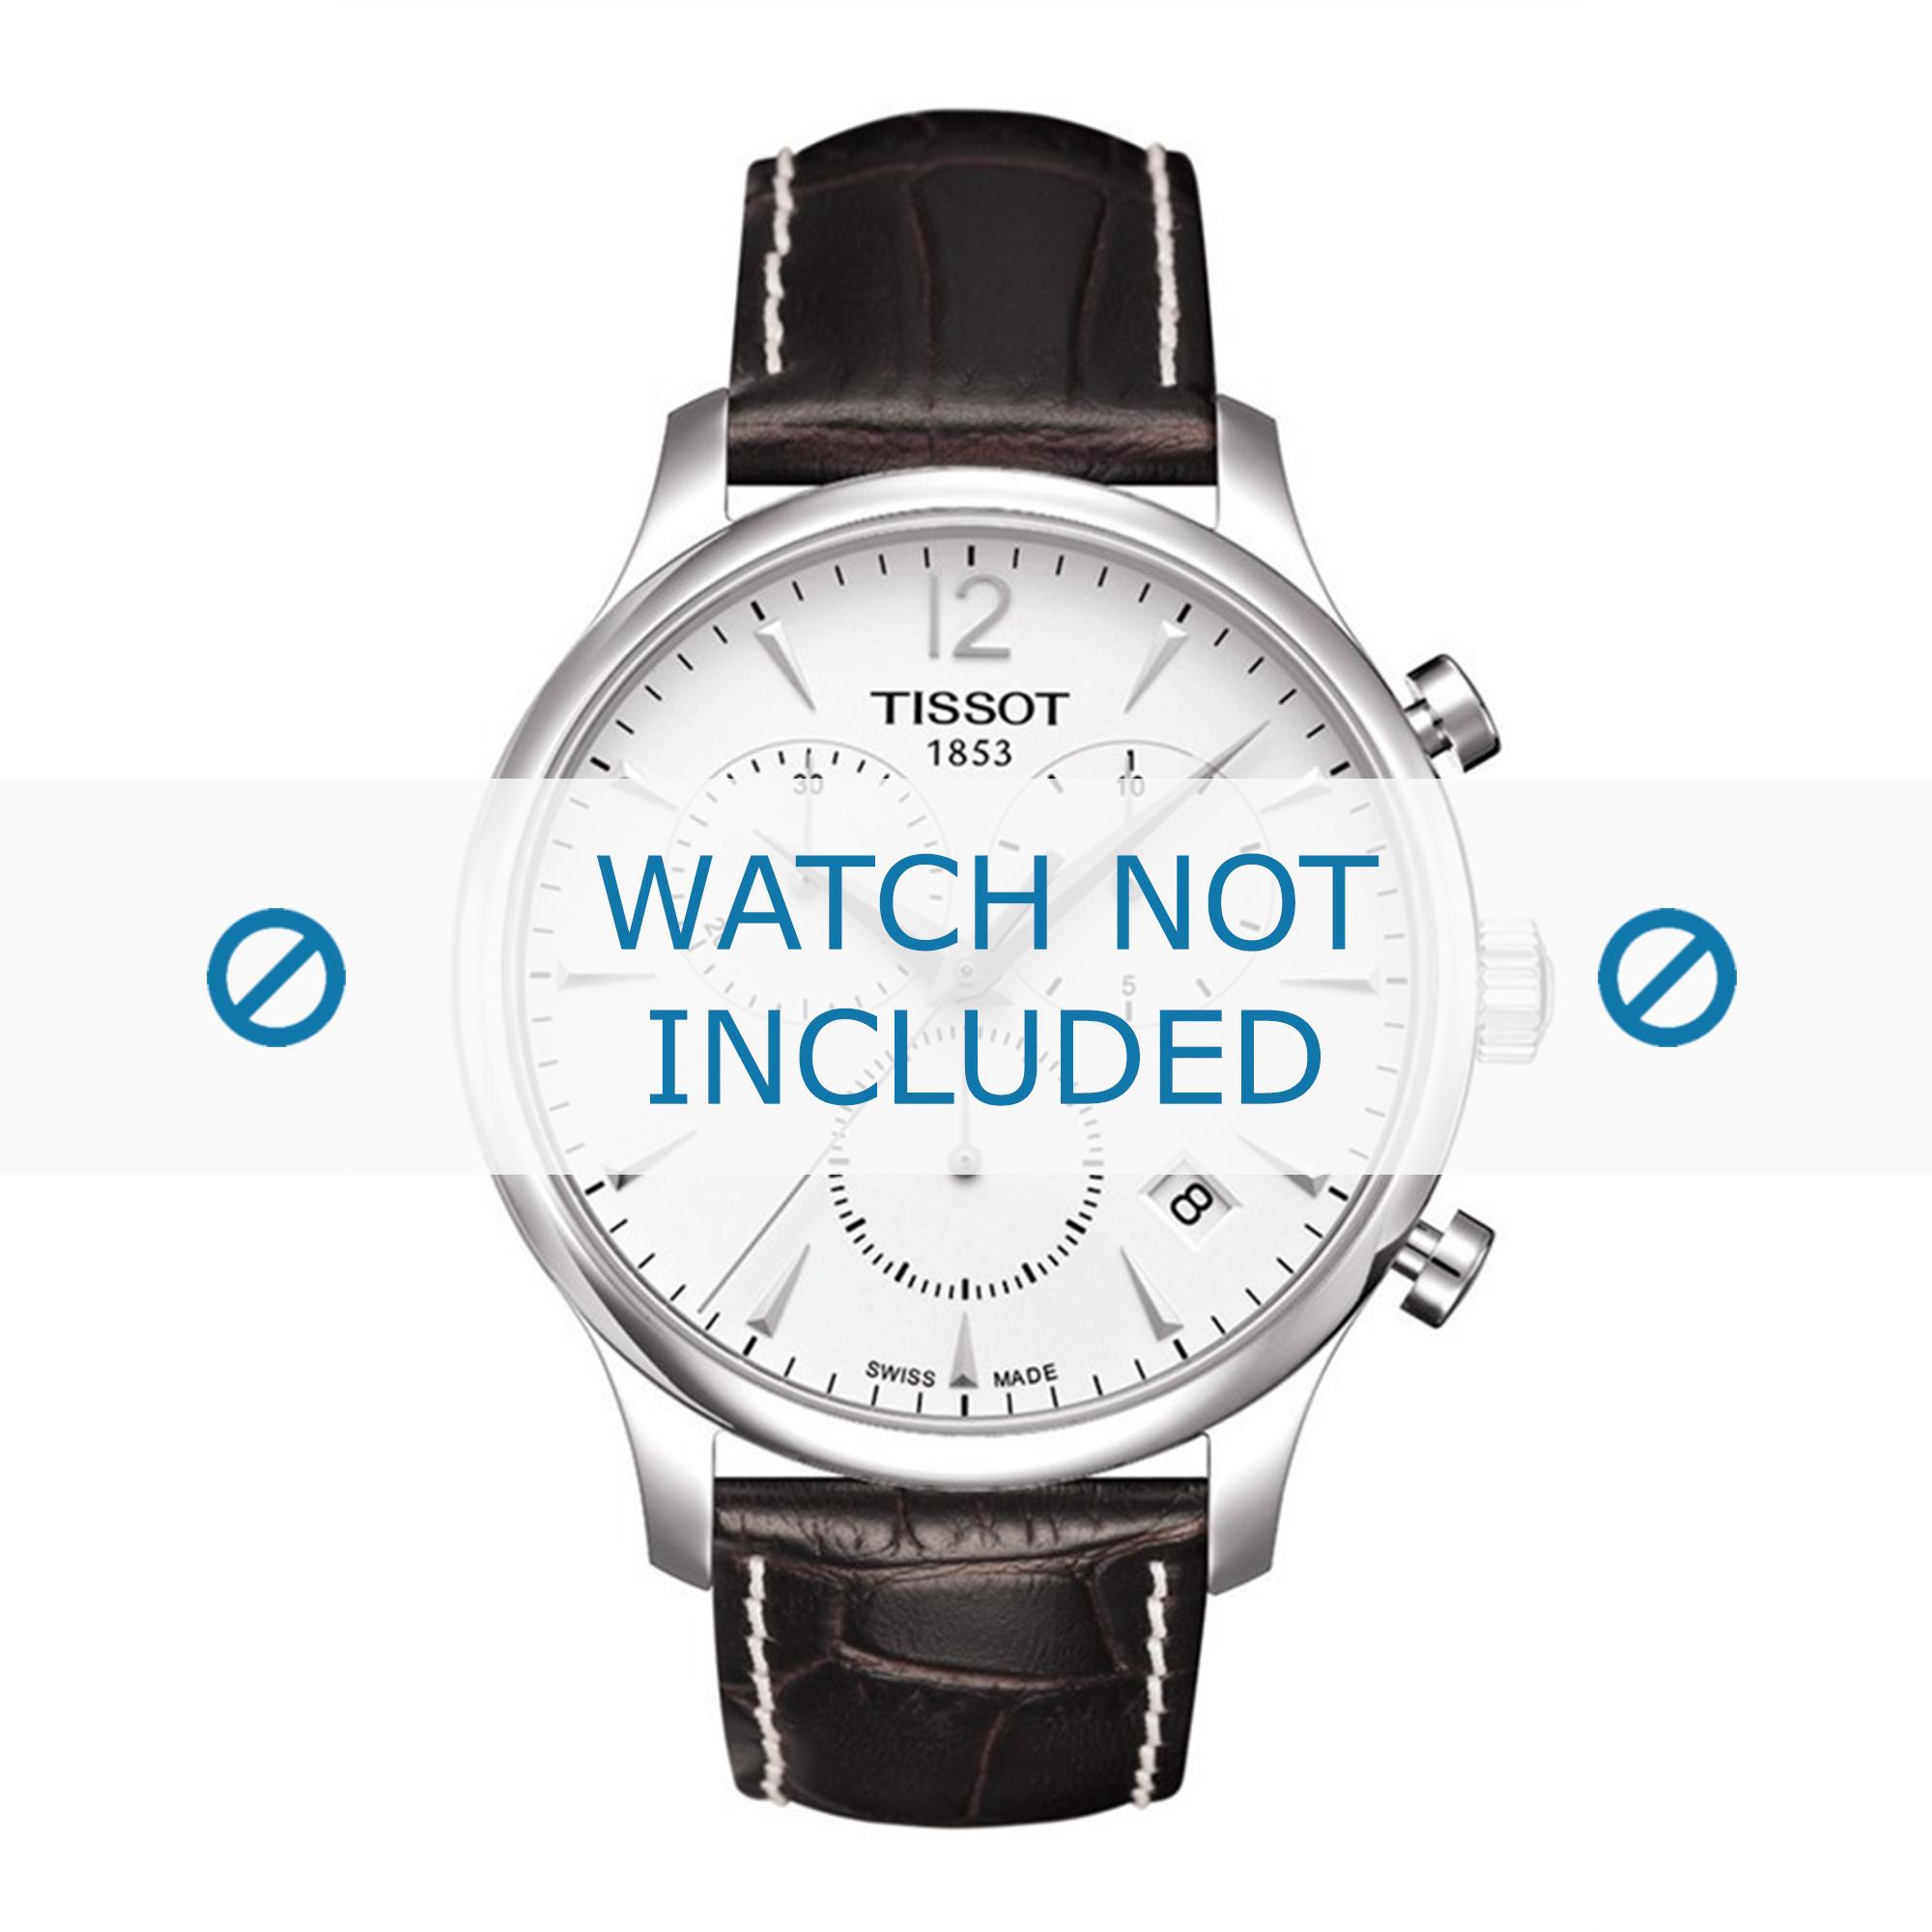 Tissot horlogeband T063.617.16.037.00 T610031126-T610031126 Croco leder Bruin 20mm + wit stiksel